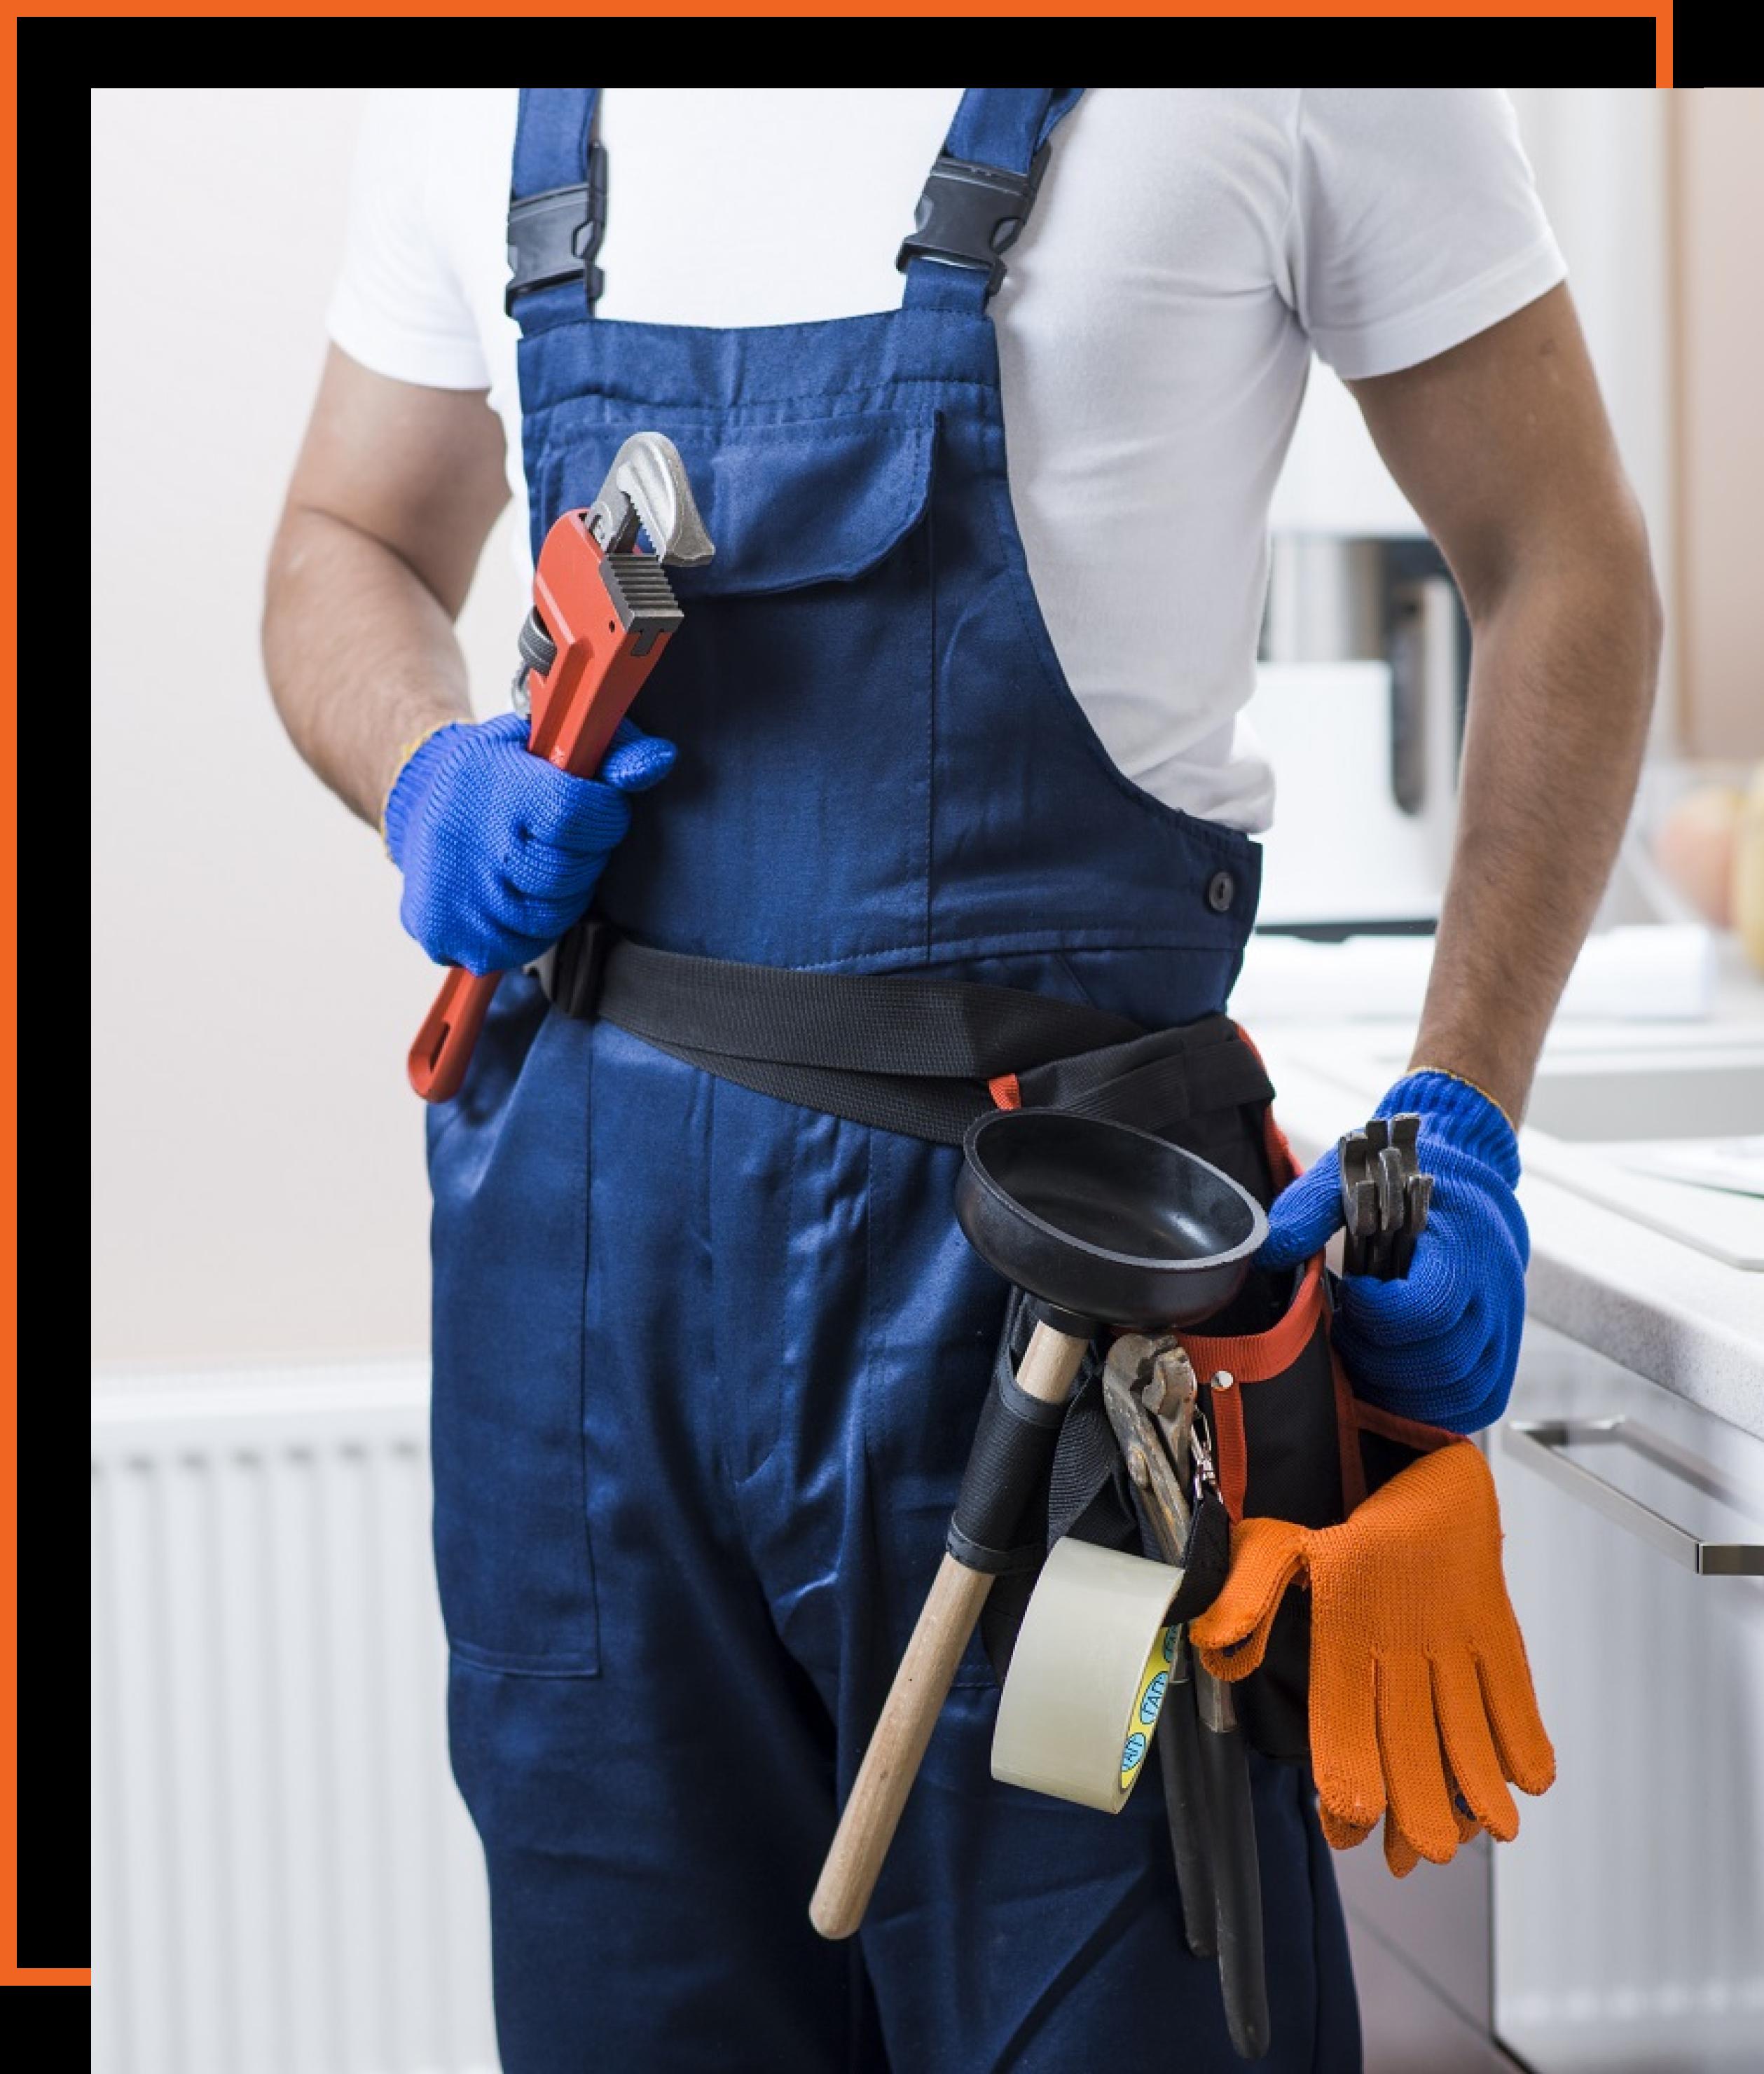 a plumbing tradesman with a decorative orange border